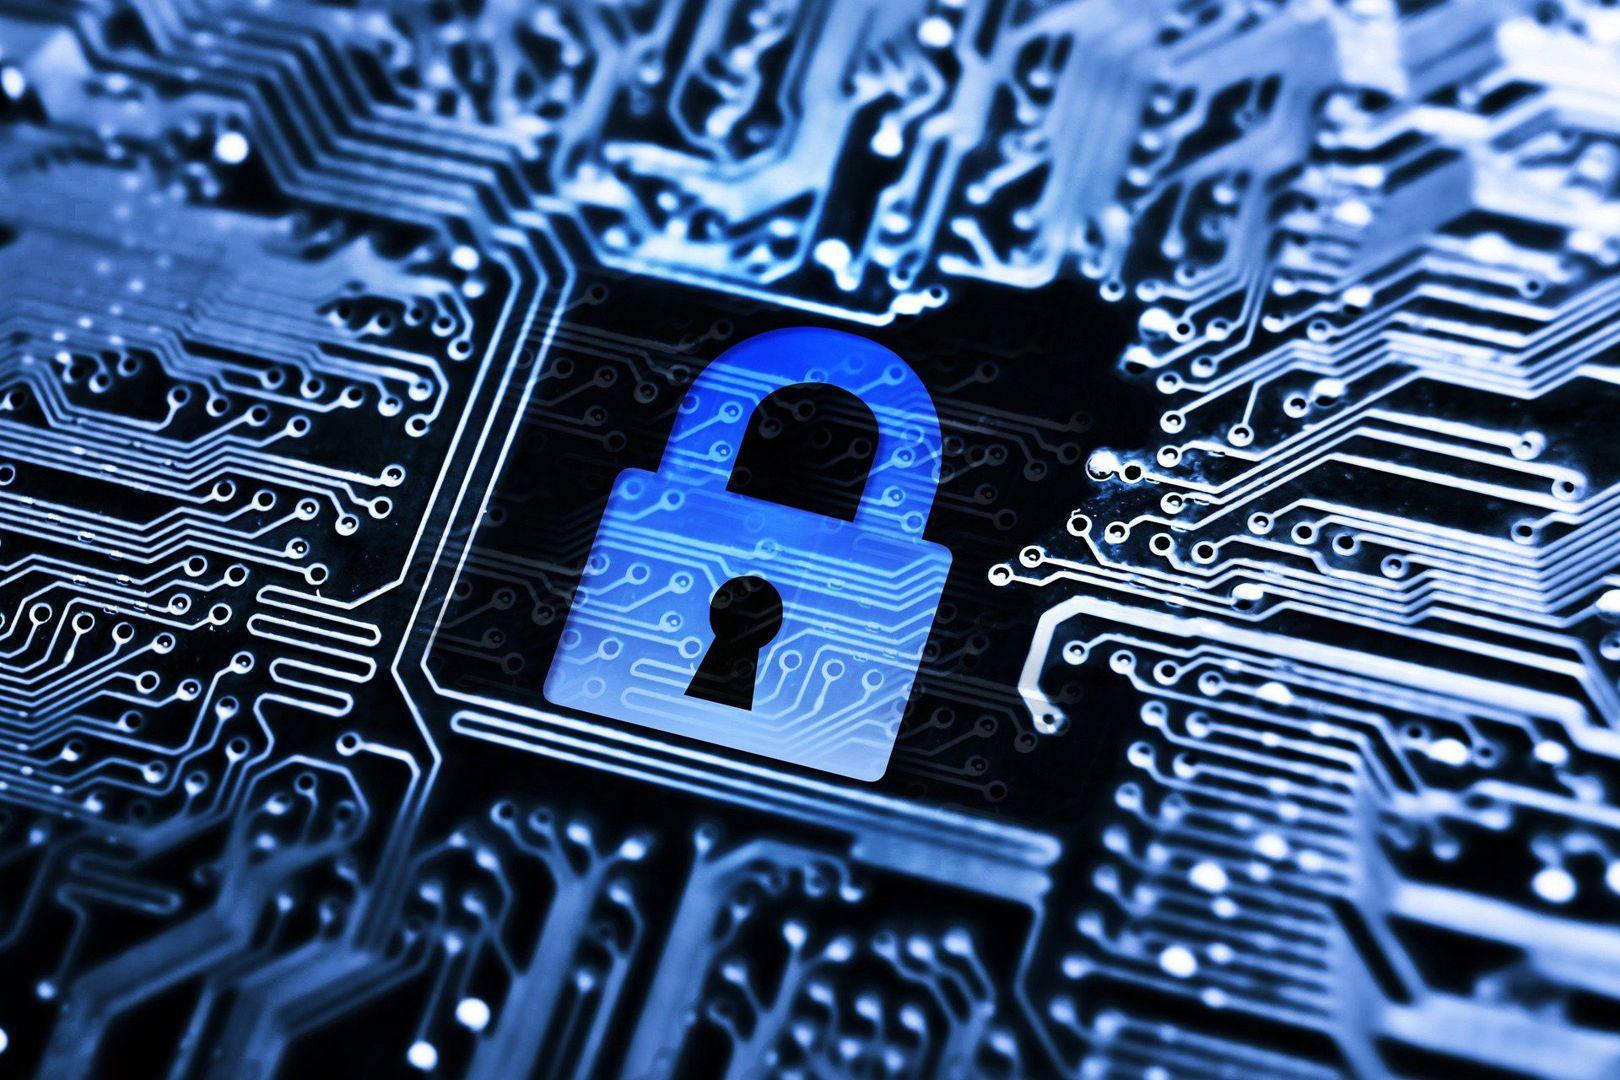 СМИ: в Таиланде создадут агентство по проблемам кибербезопасности